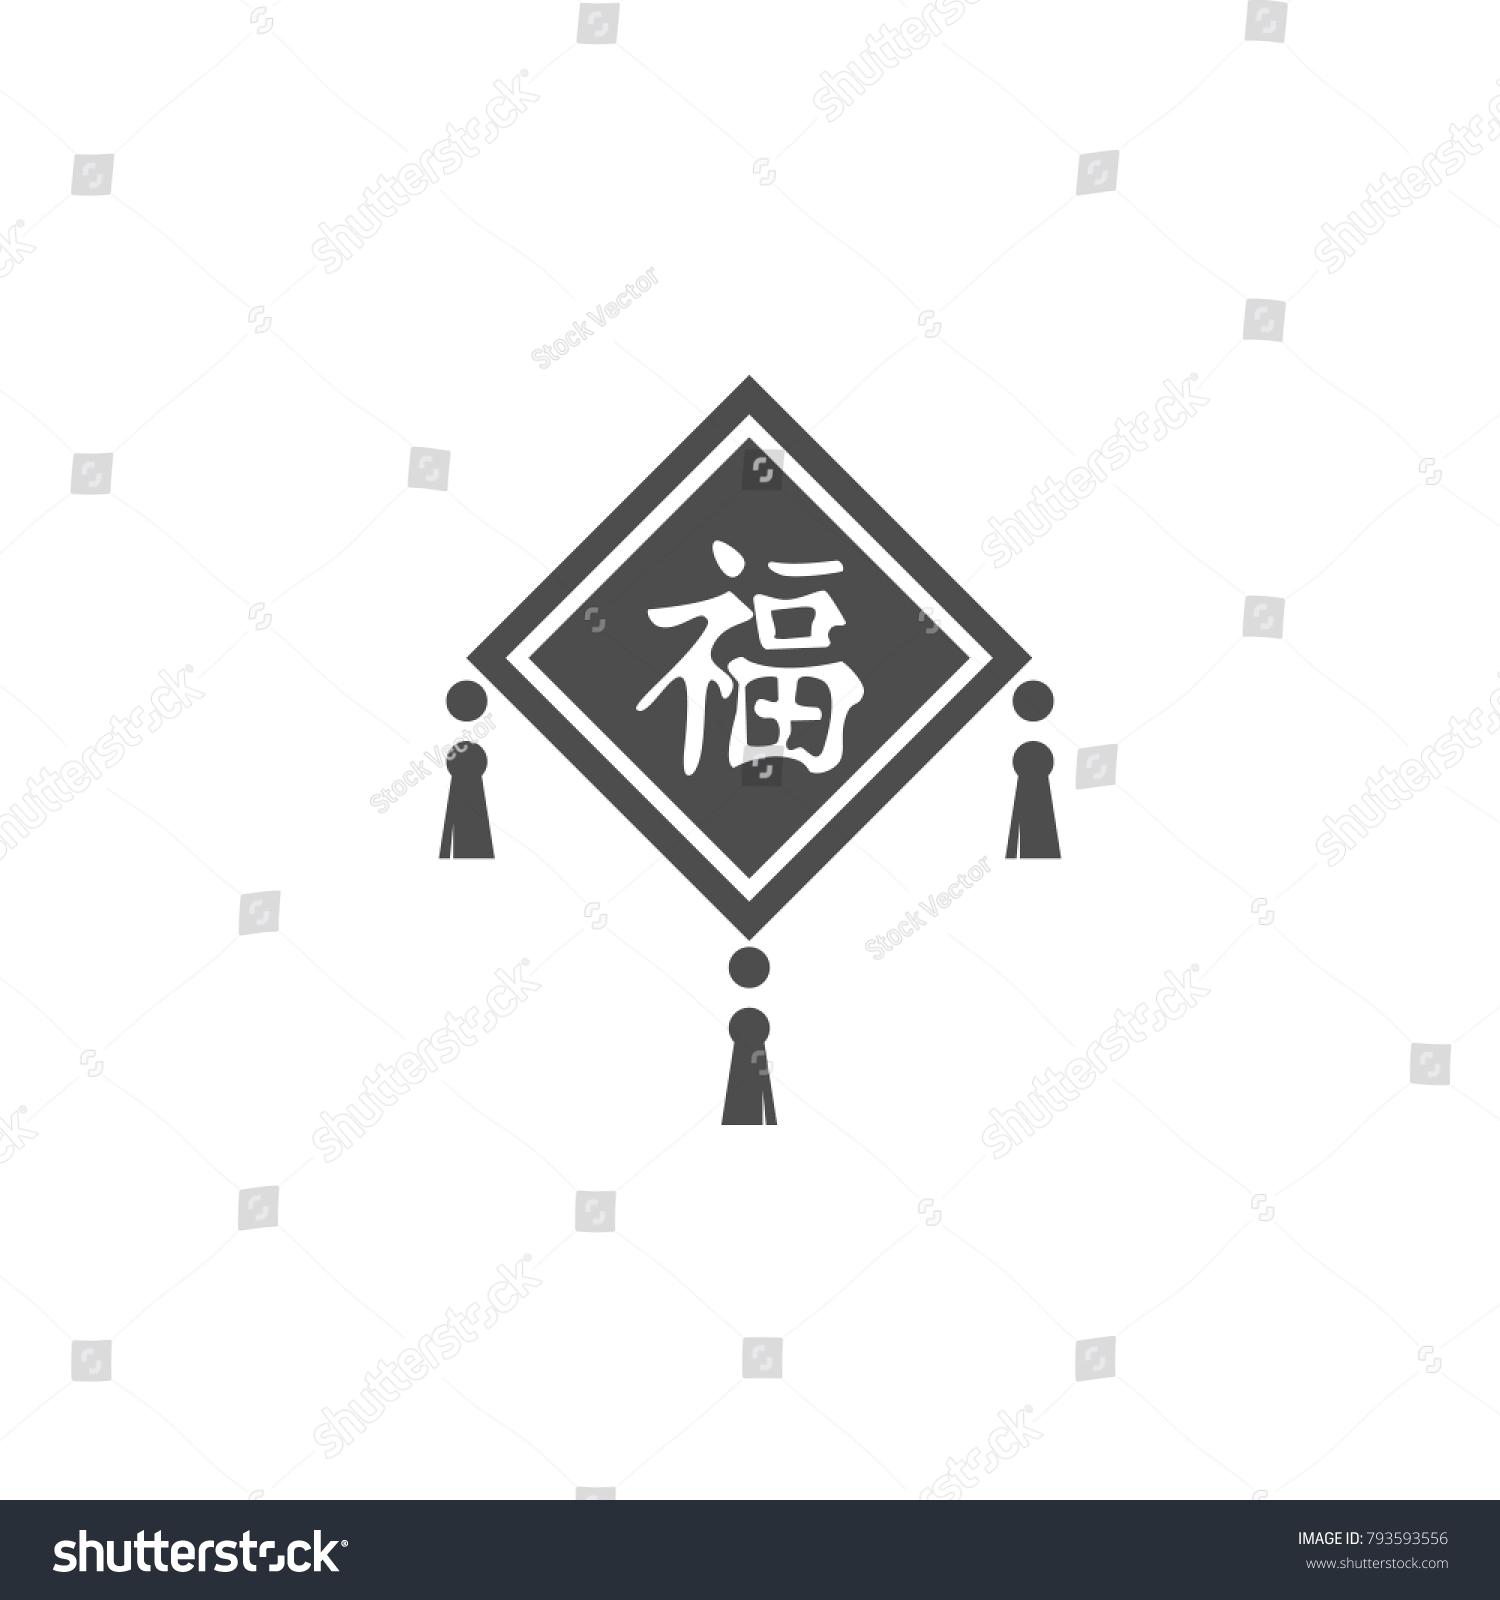 Chinese decor icon elements chinese culture stock vector 793593556 chinese decor icon elements of chinese culture icon premium quality graphic design icon buycottarizona